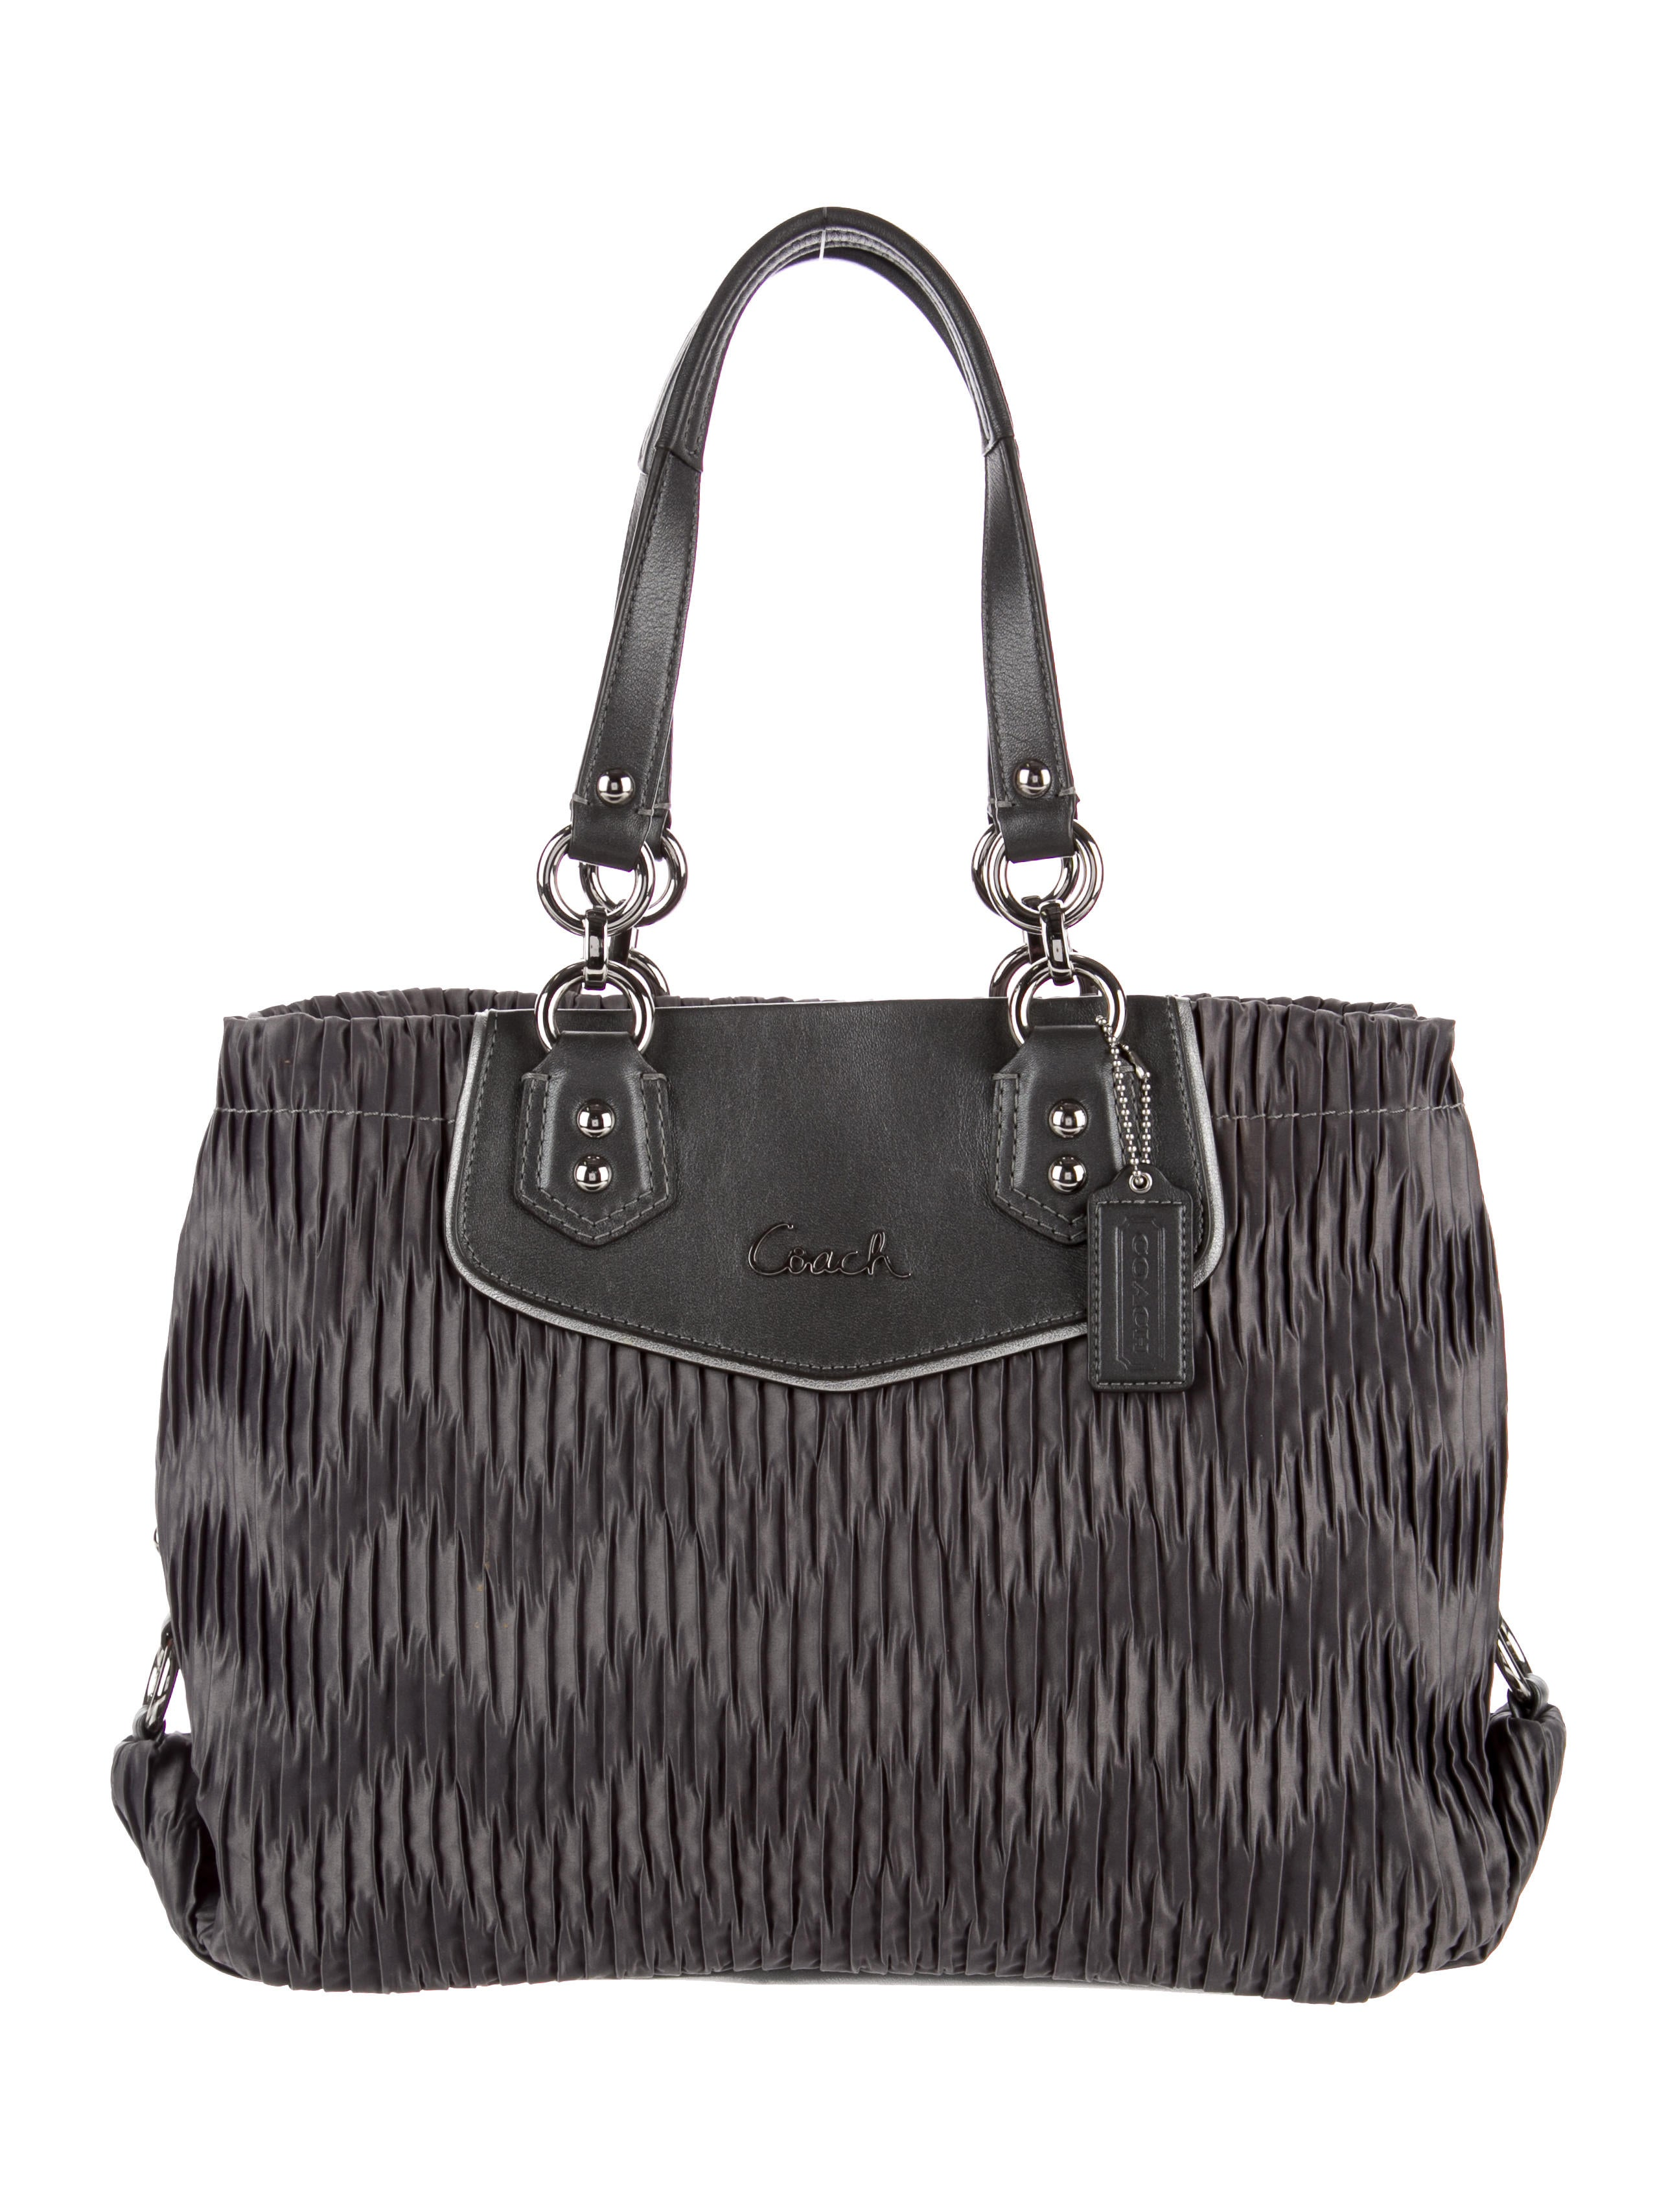 3333d501fa2c Coach Red Ruched Leather Shoulder Bag   Stanford Center for ...